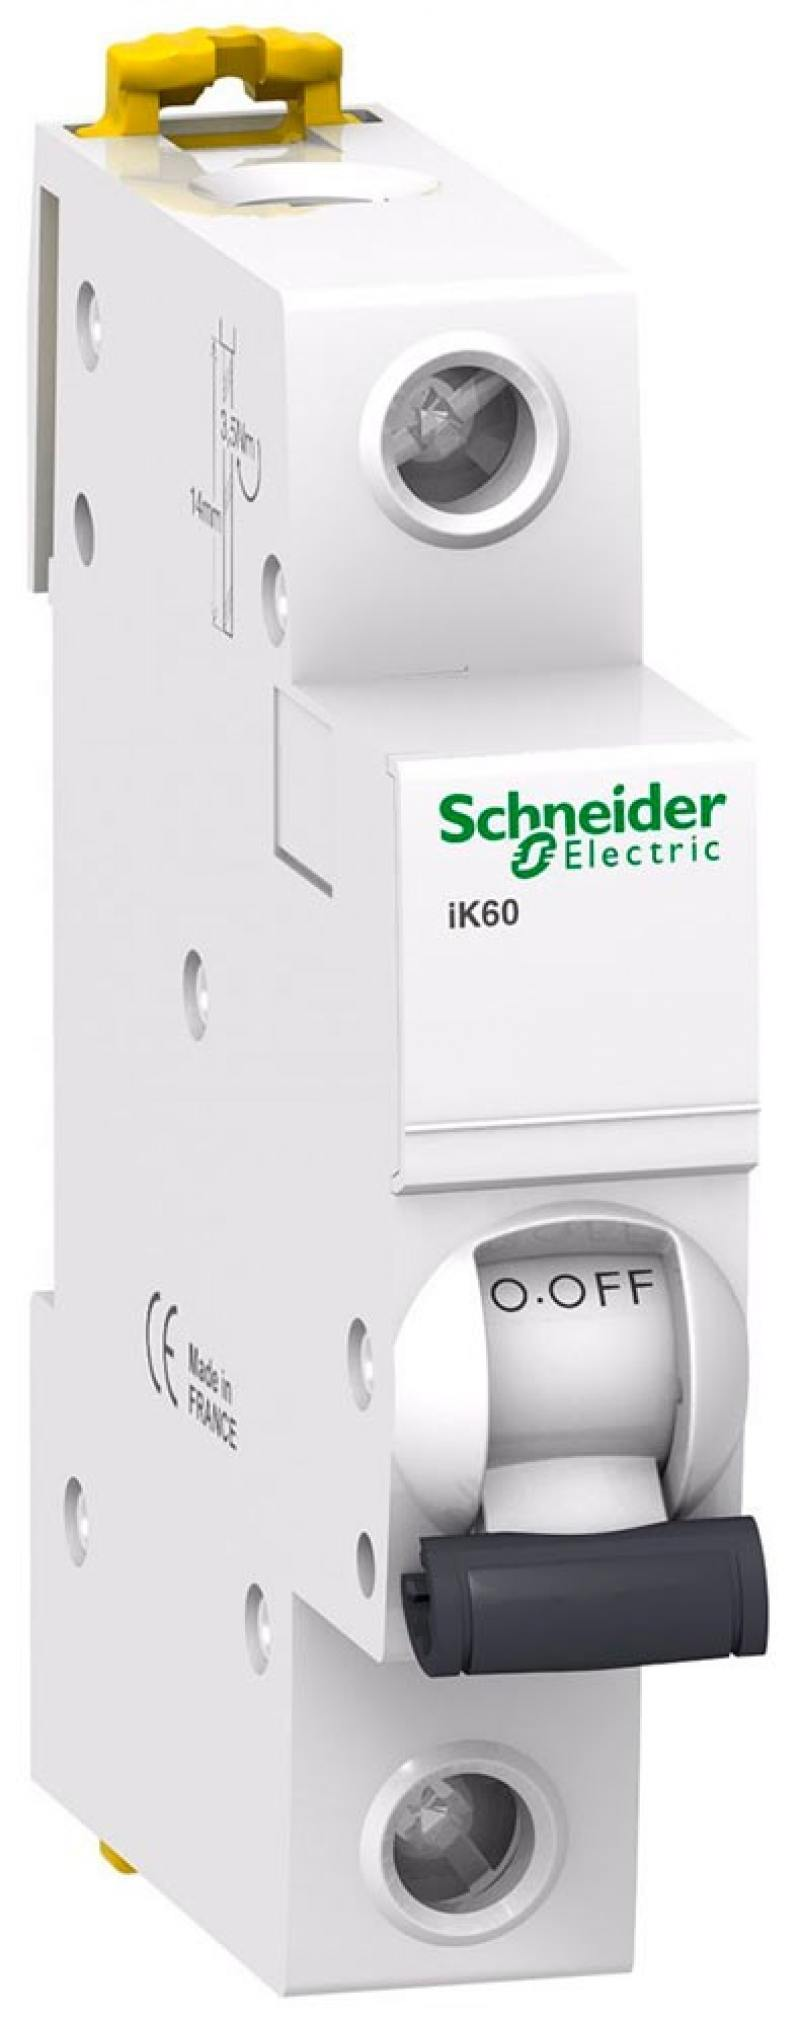 Автоматический выключатель Schneider Electric iK60 1П 25A C A9K24125 2pcs 25a ssr input dc 0 10v single phase ssr solid state relay voltage regulator